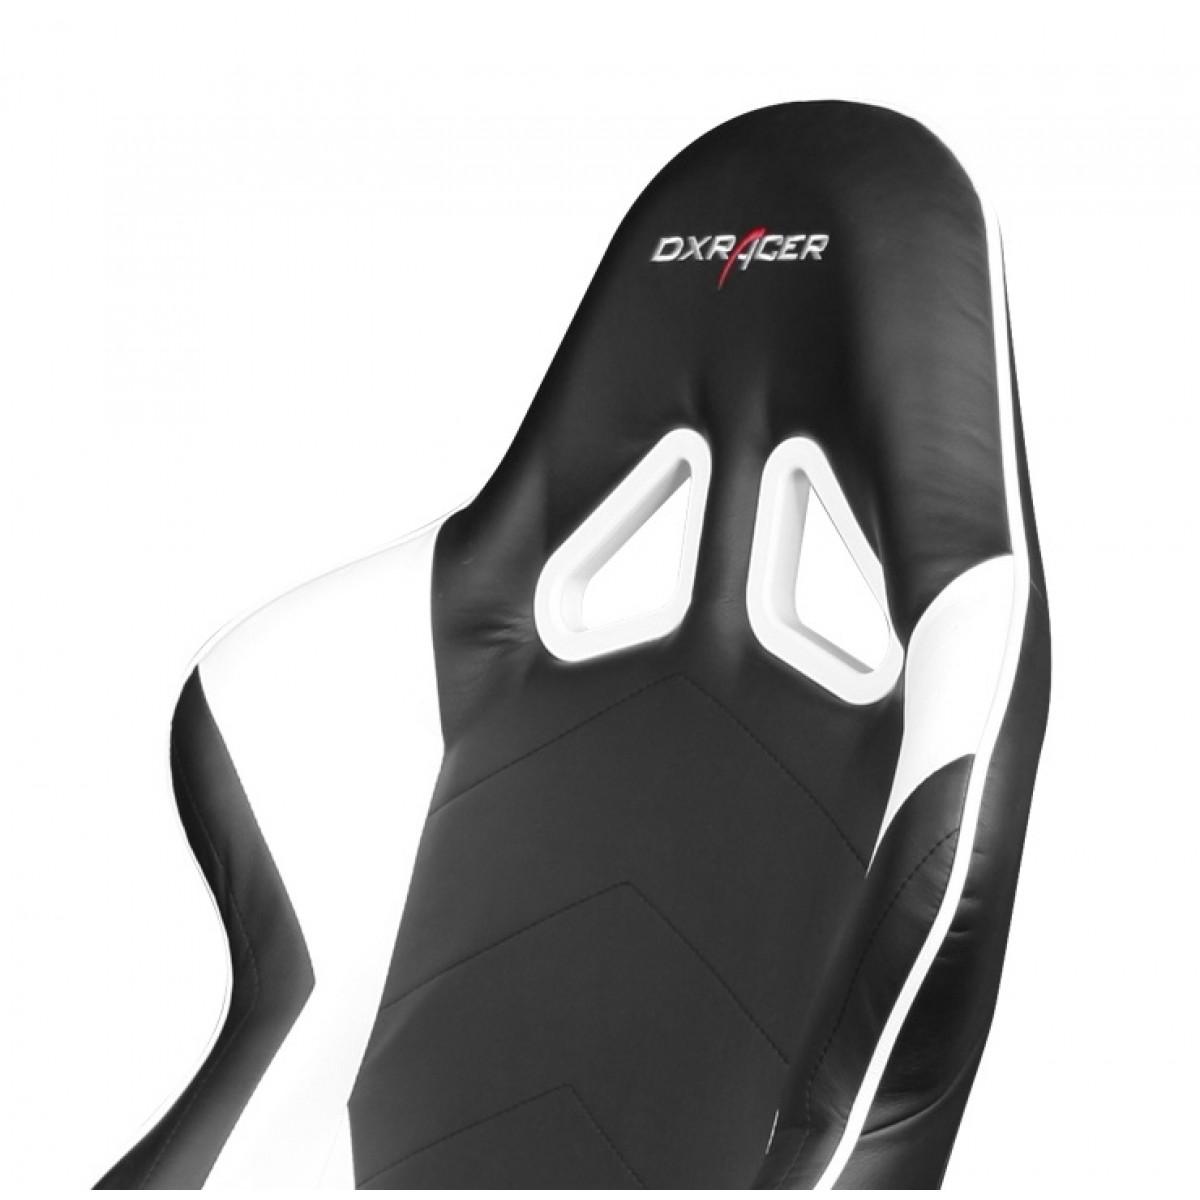 Cadeira R-Series OH/RF00/NW Preto/Branco - DXRacer